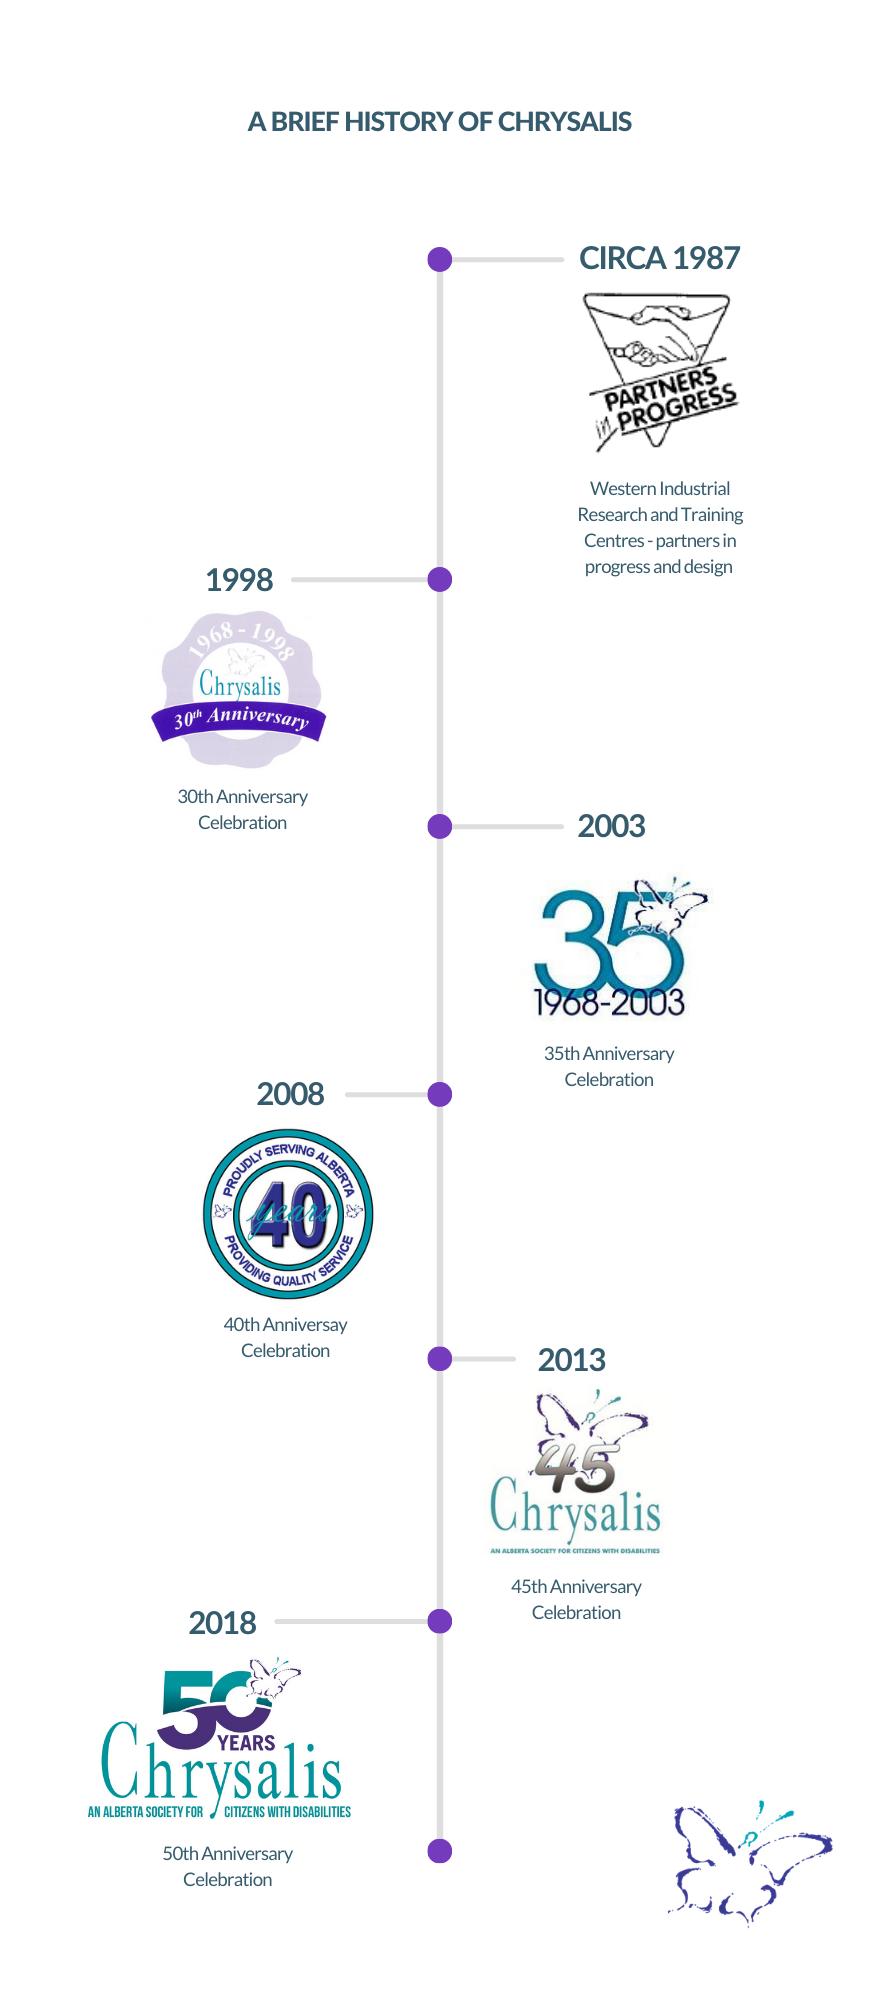 Brief history timeline of Chrysalis' anniversary logos